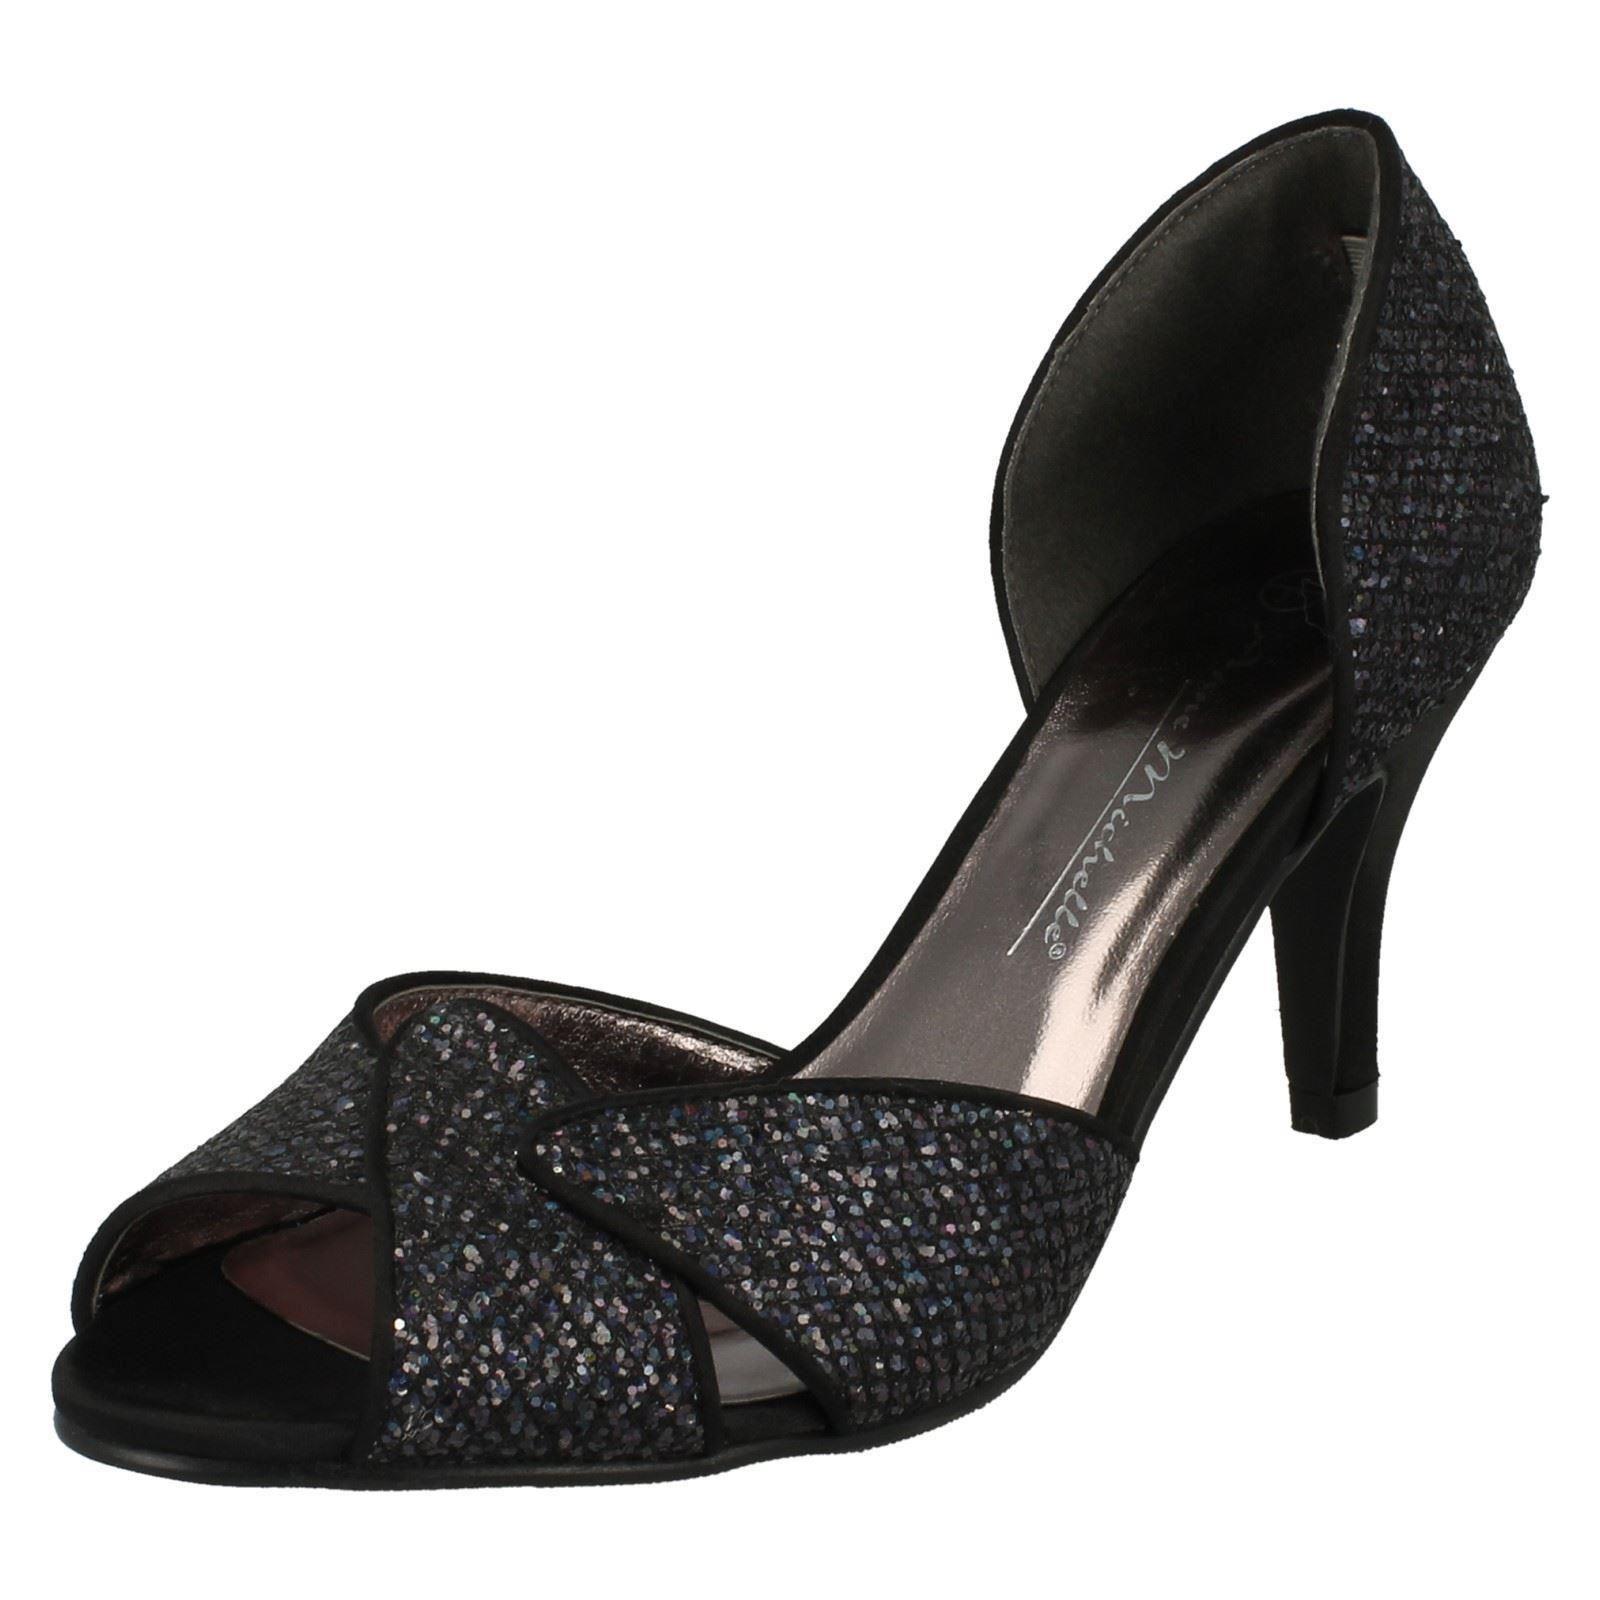 0cb699697f45 Ladies Anne Michelle Glitter Evening Shoes F10309 K Black UK 8 ...